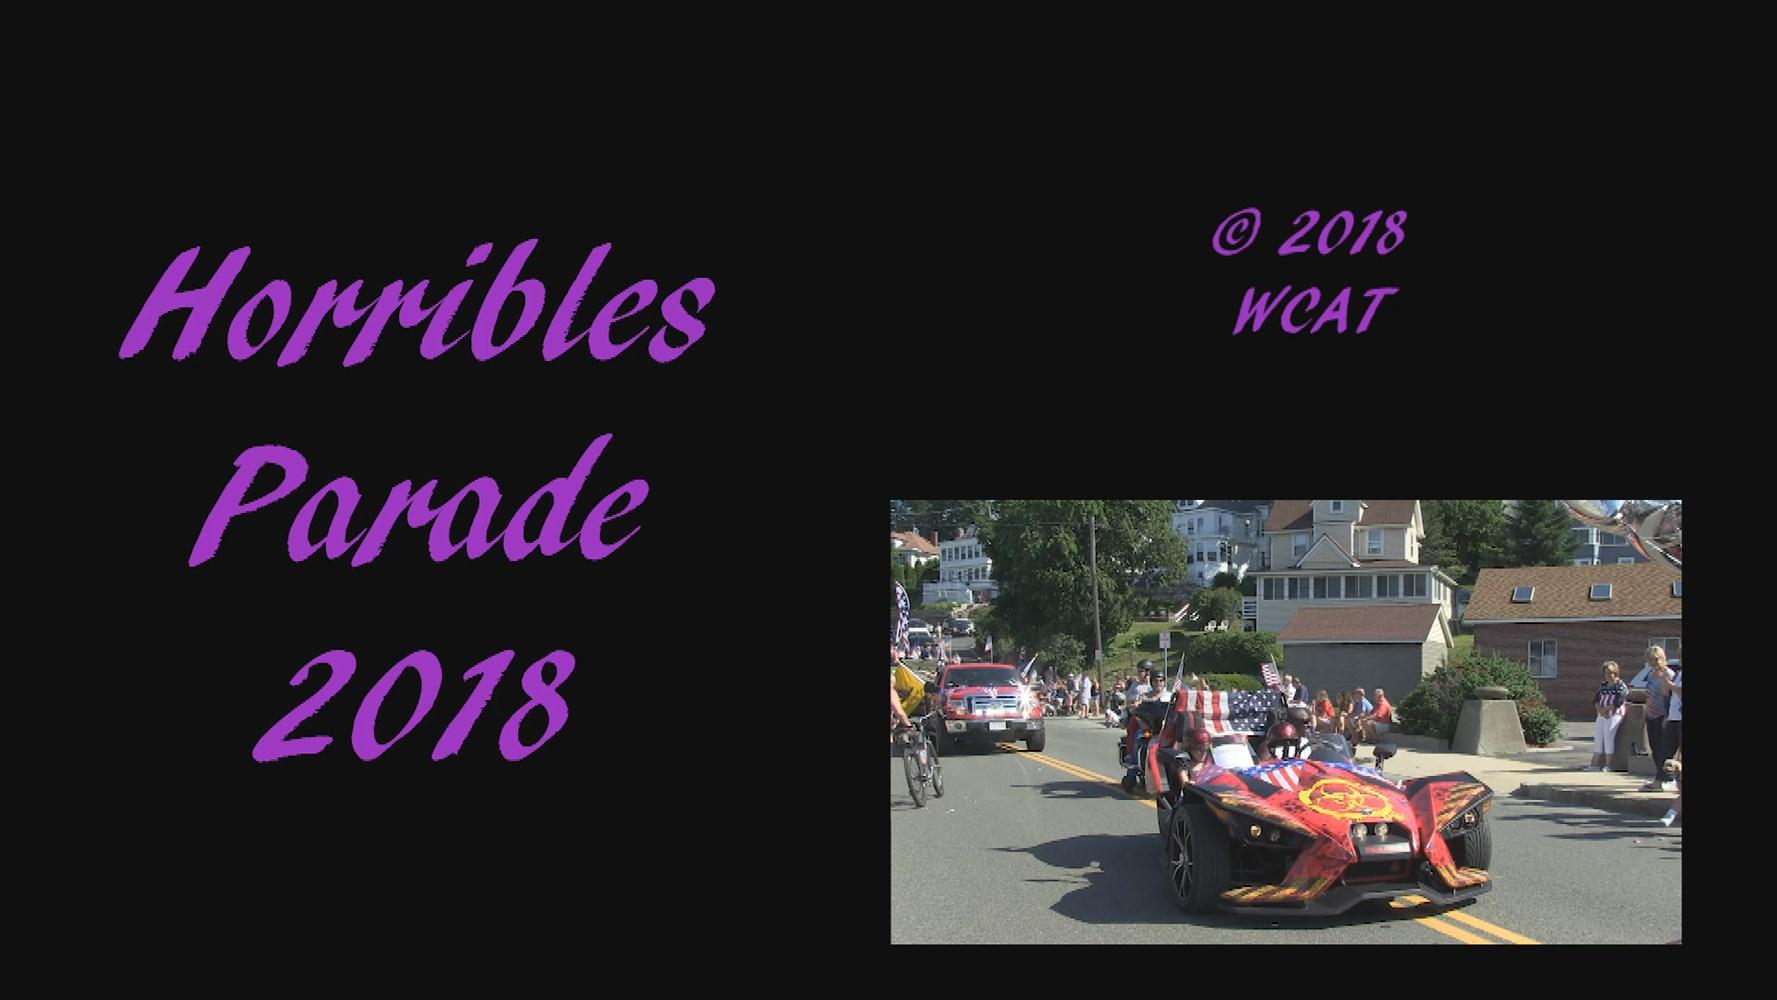 The Horribles Parade 2018